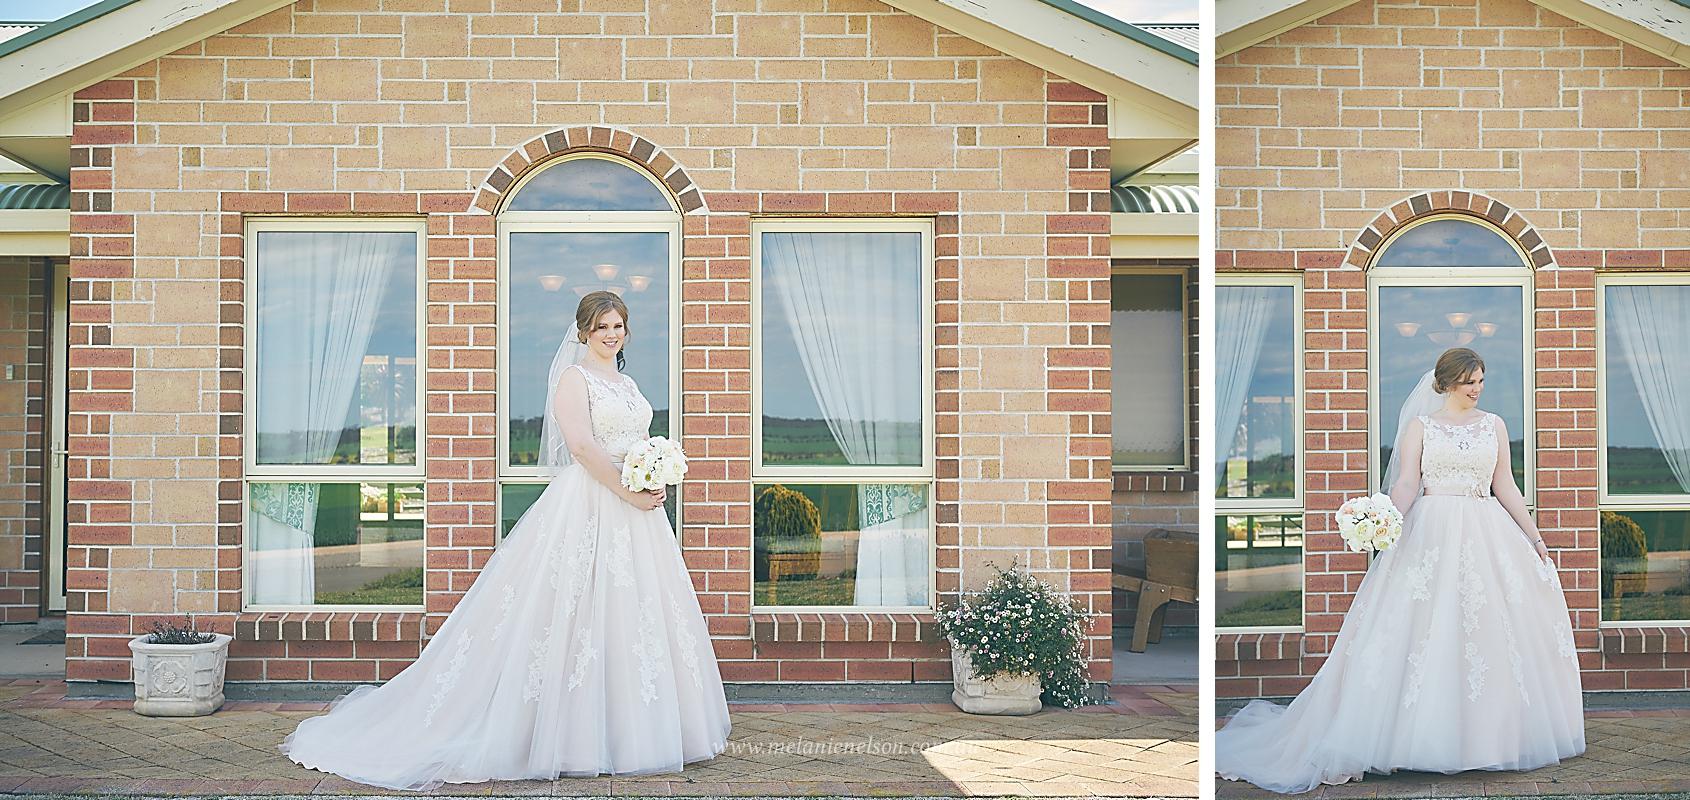 yorke_peninsula_wedding_photographer_0019.jpg